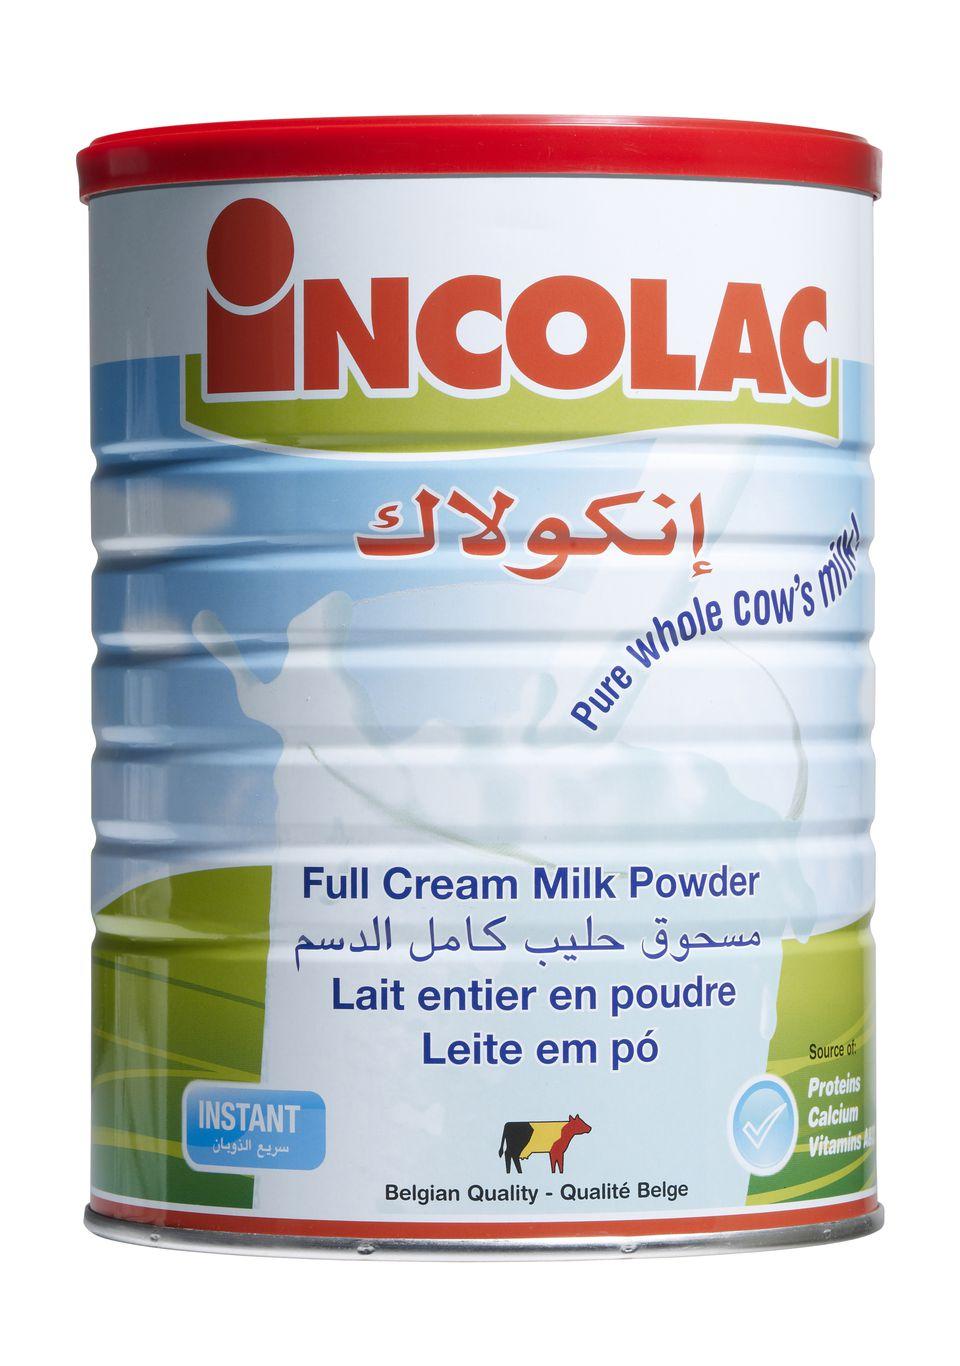 Incolac milk powder